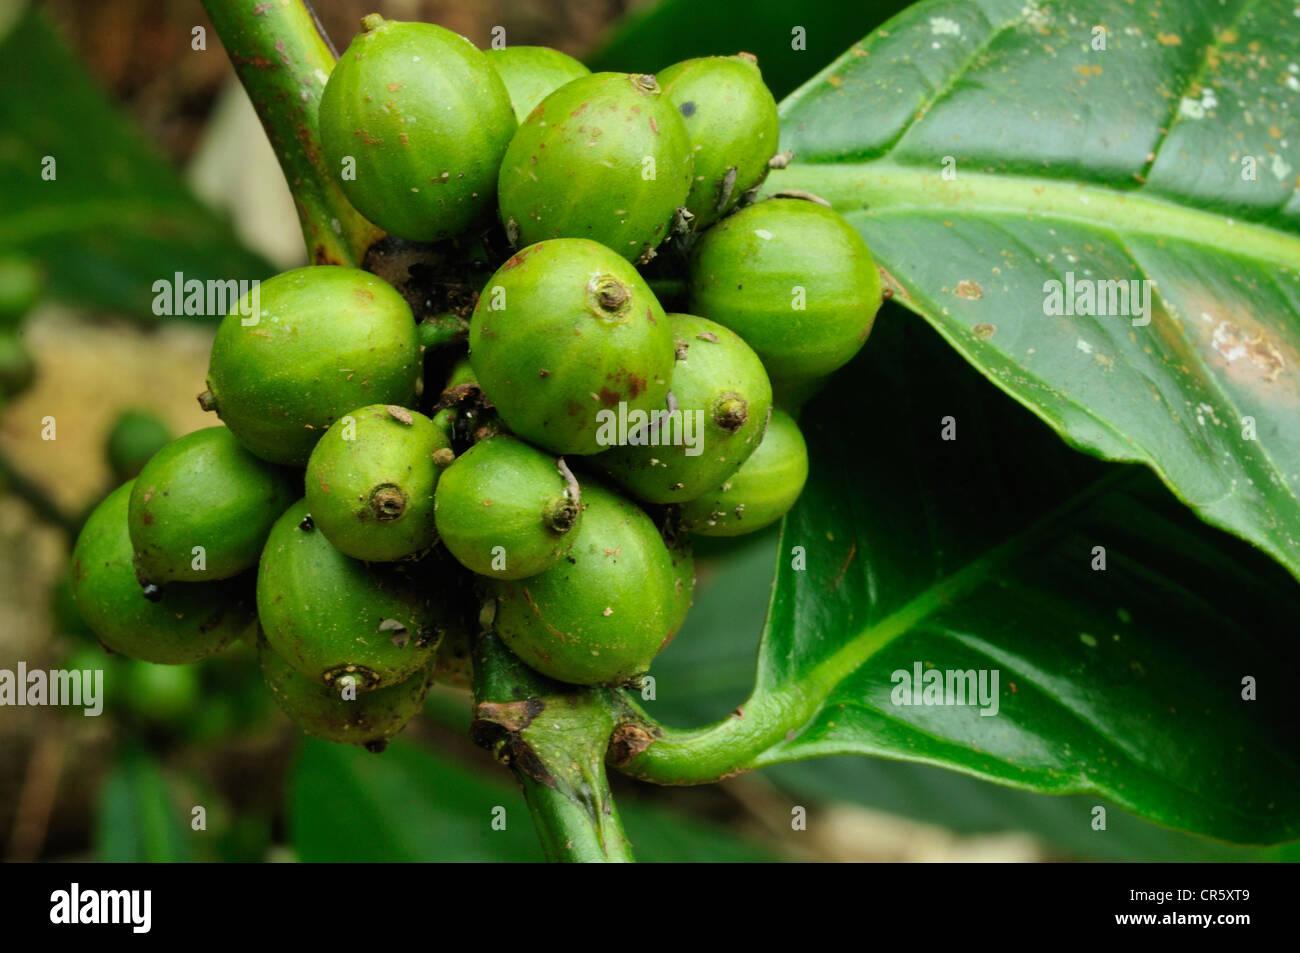 Fruits of coffee plant, Coffea arabica, Bali forest, Indonesia, Asia - Stock Image